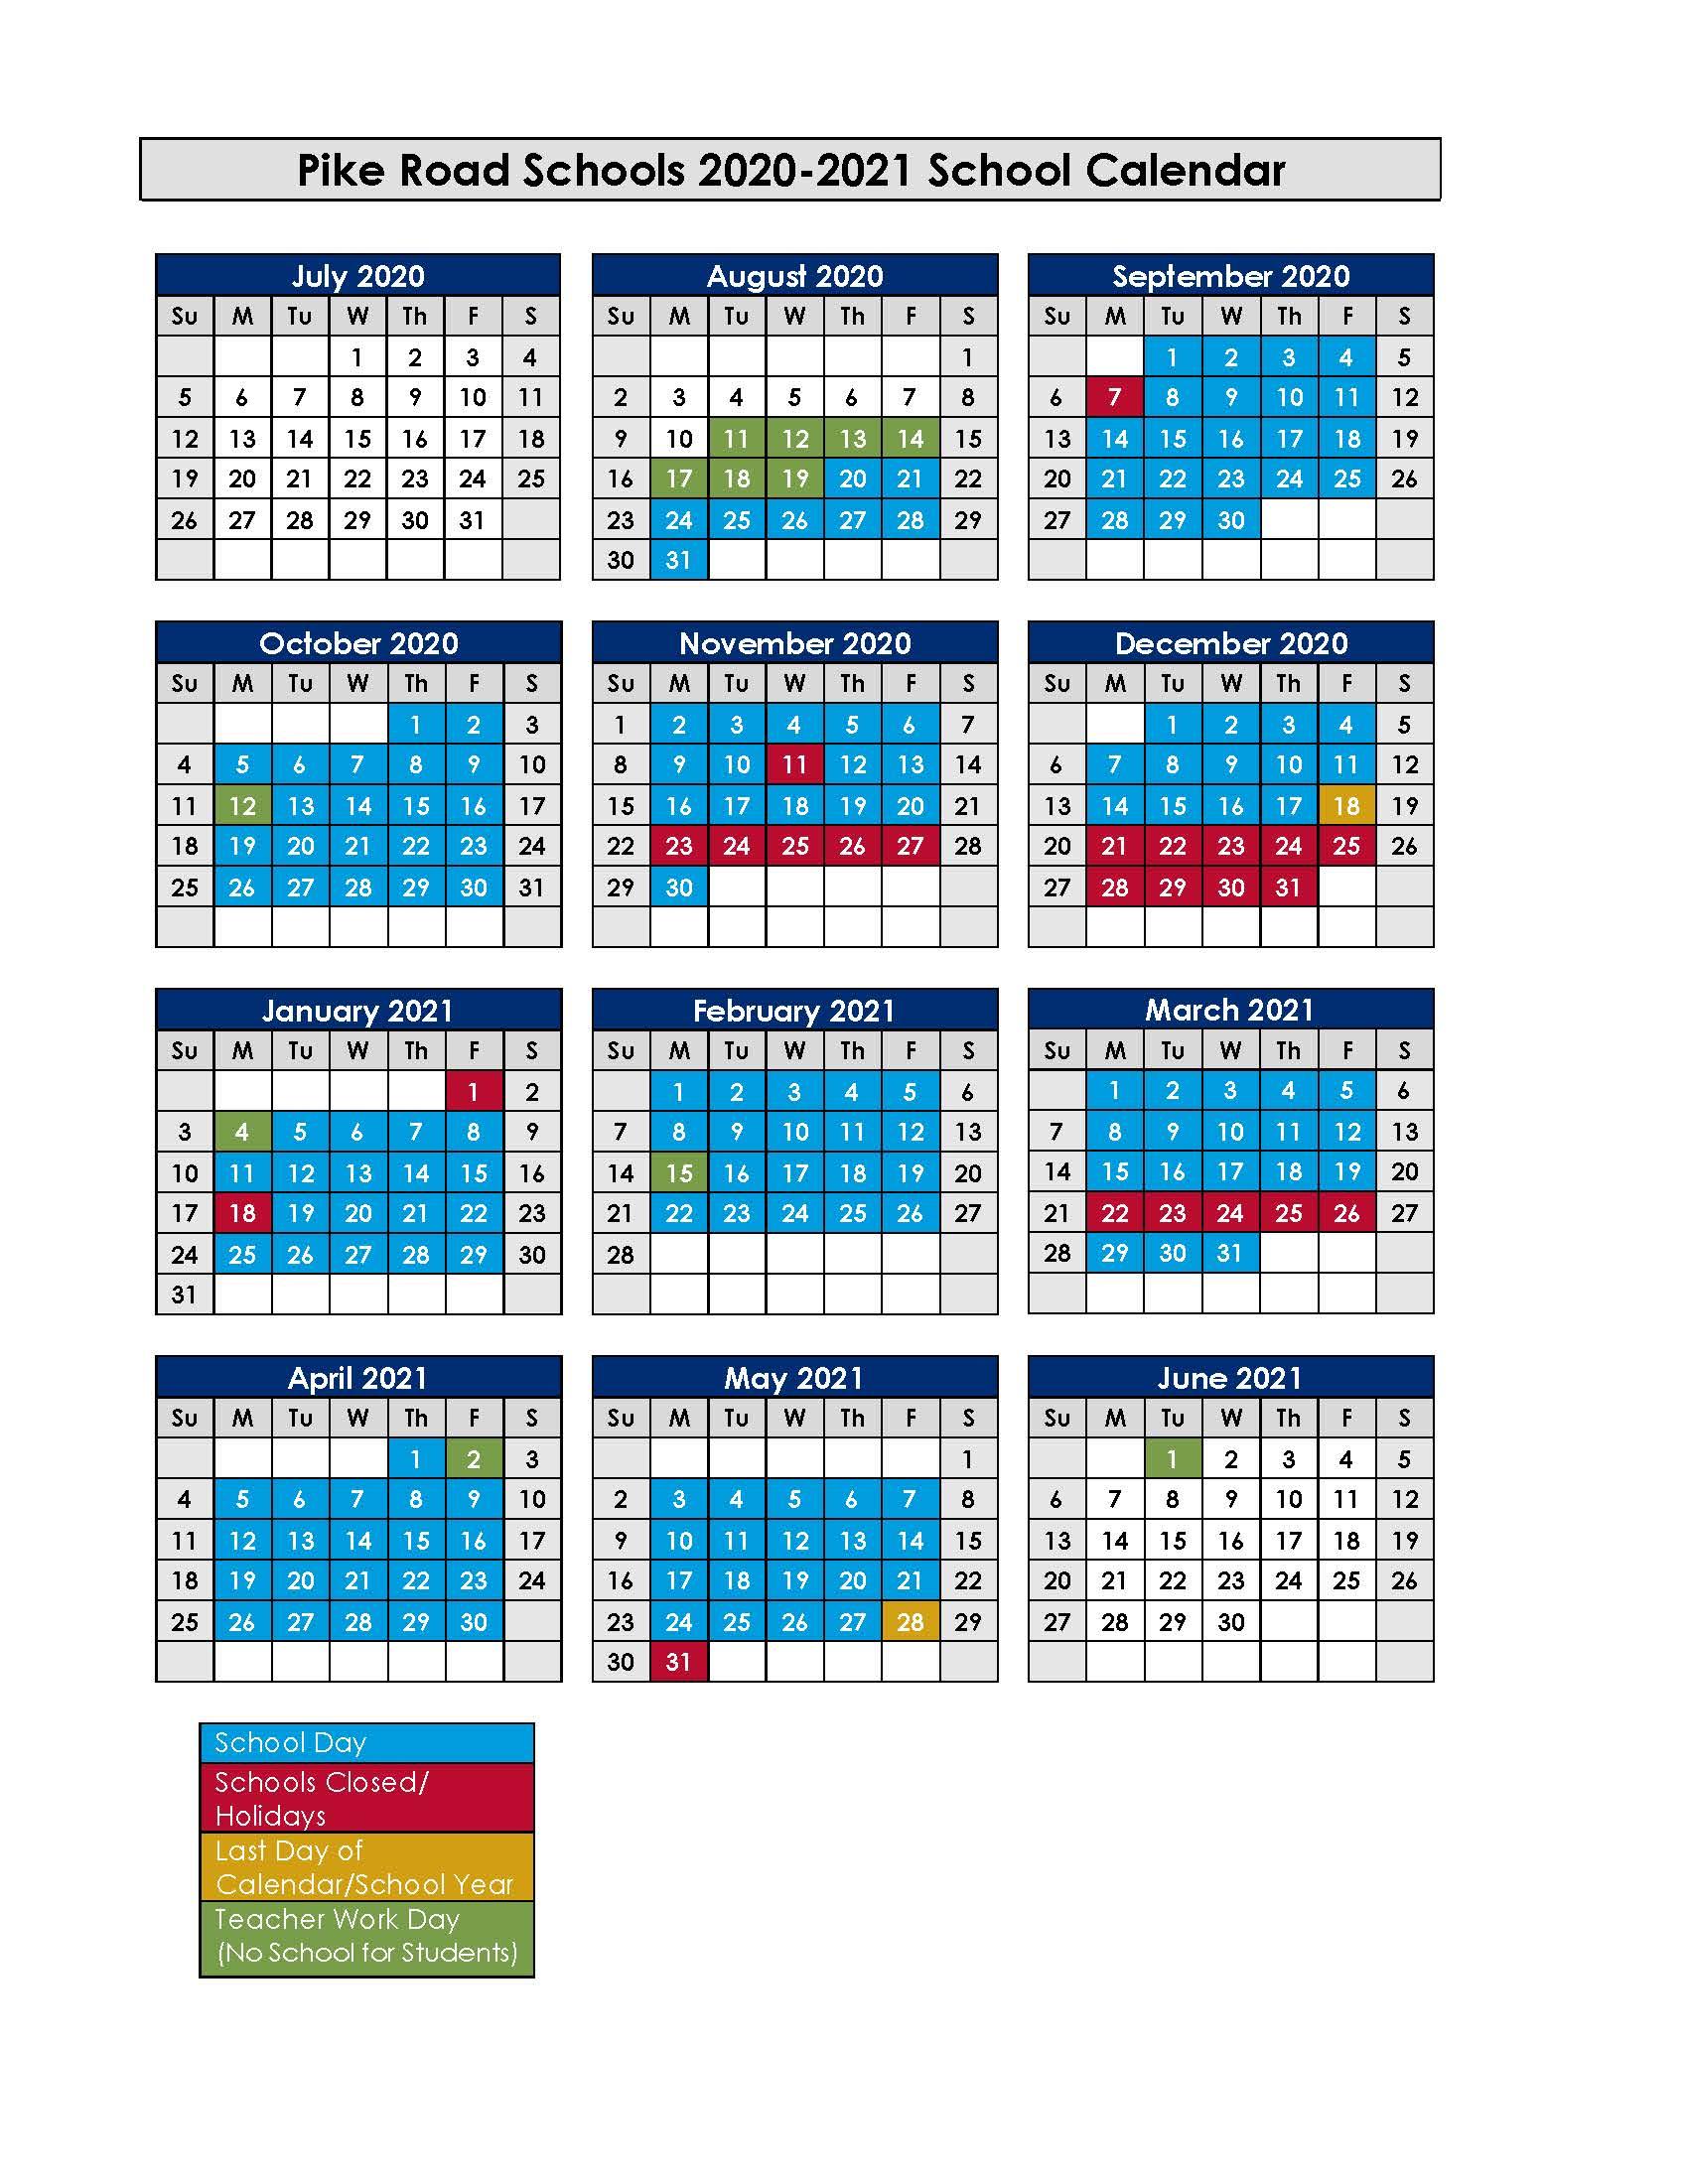 PRS 2020/2021 Calendar